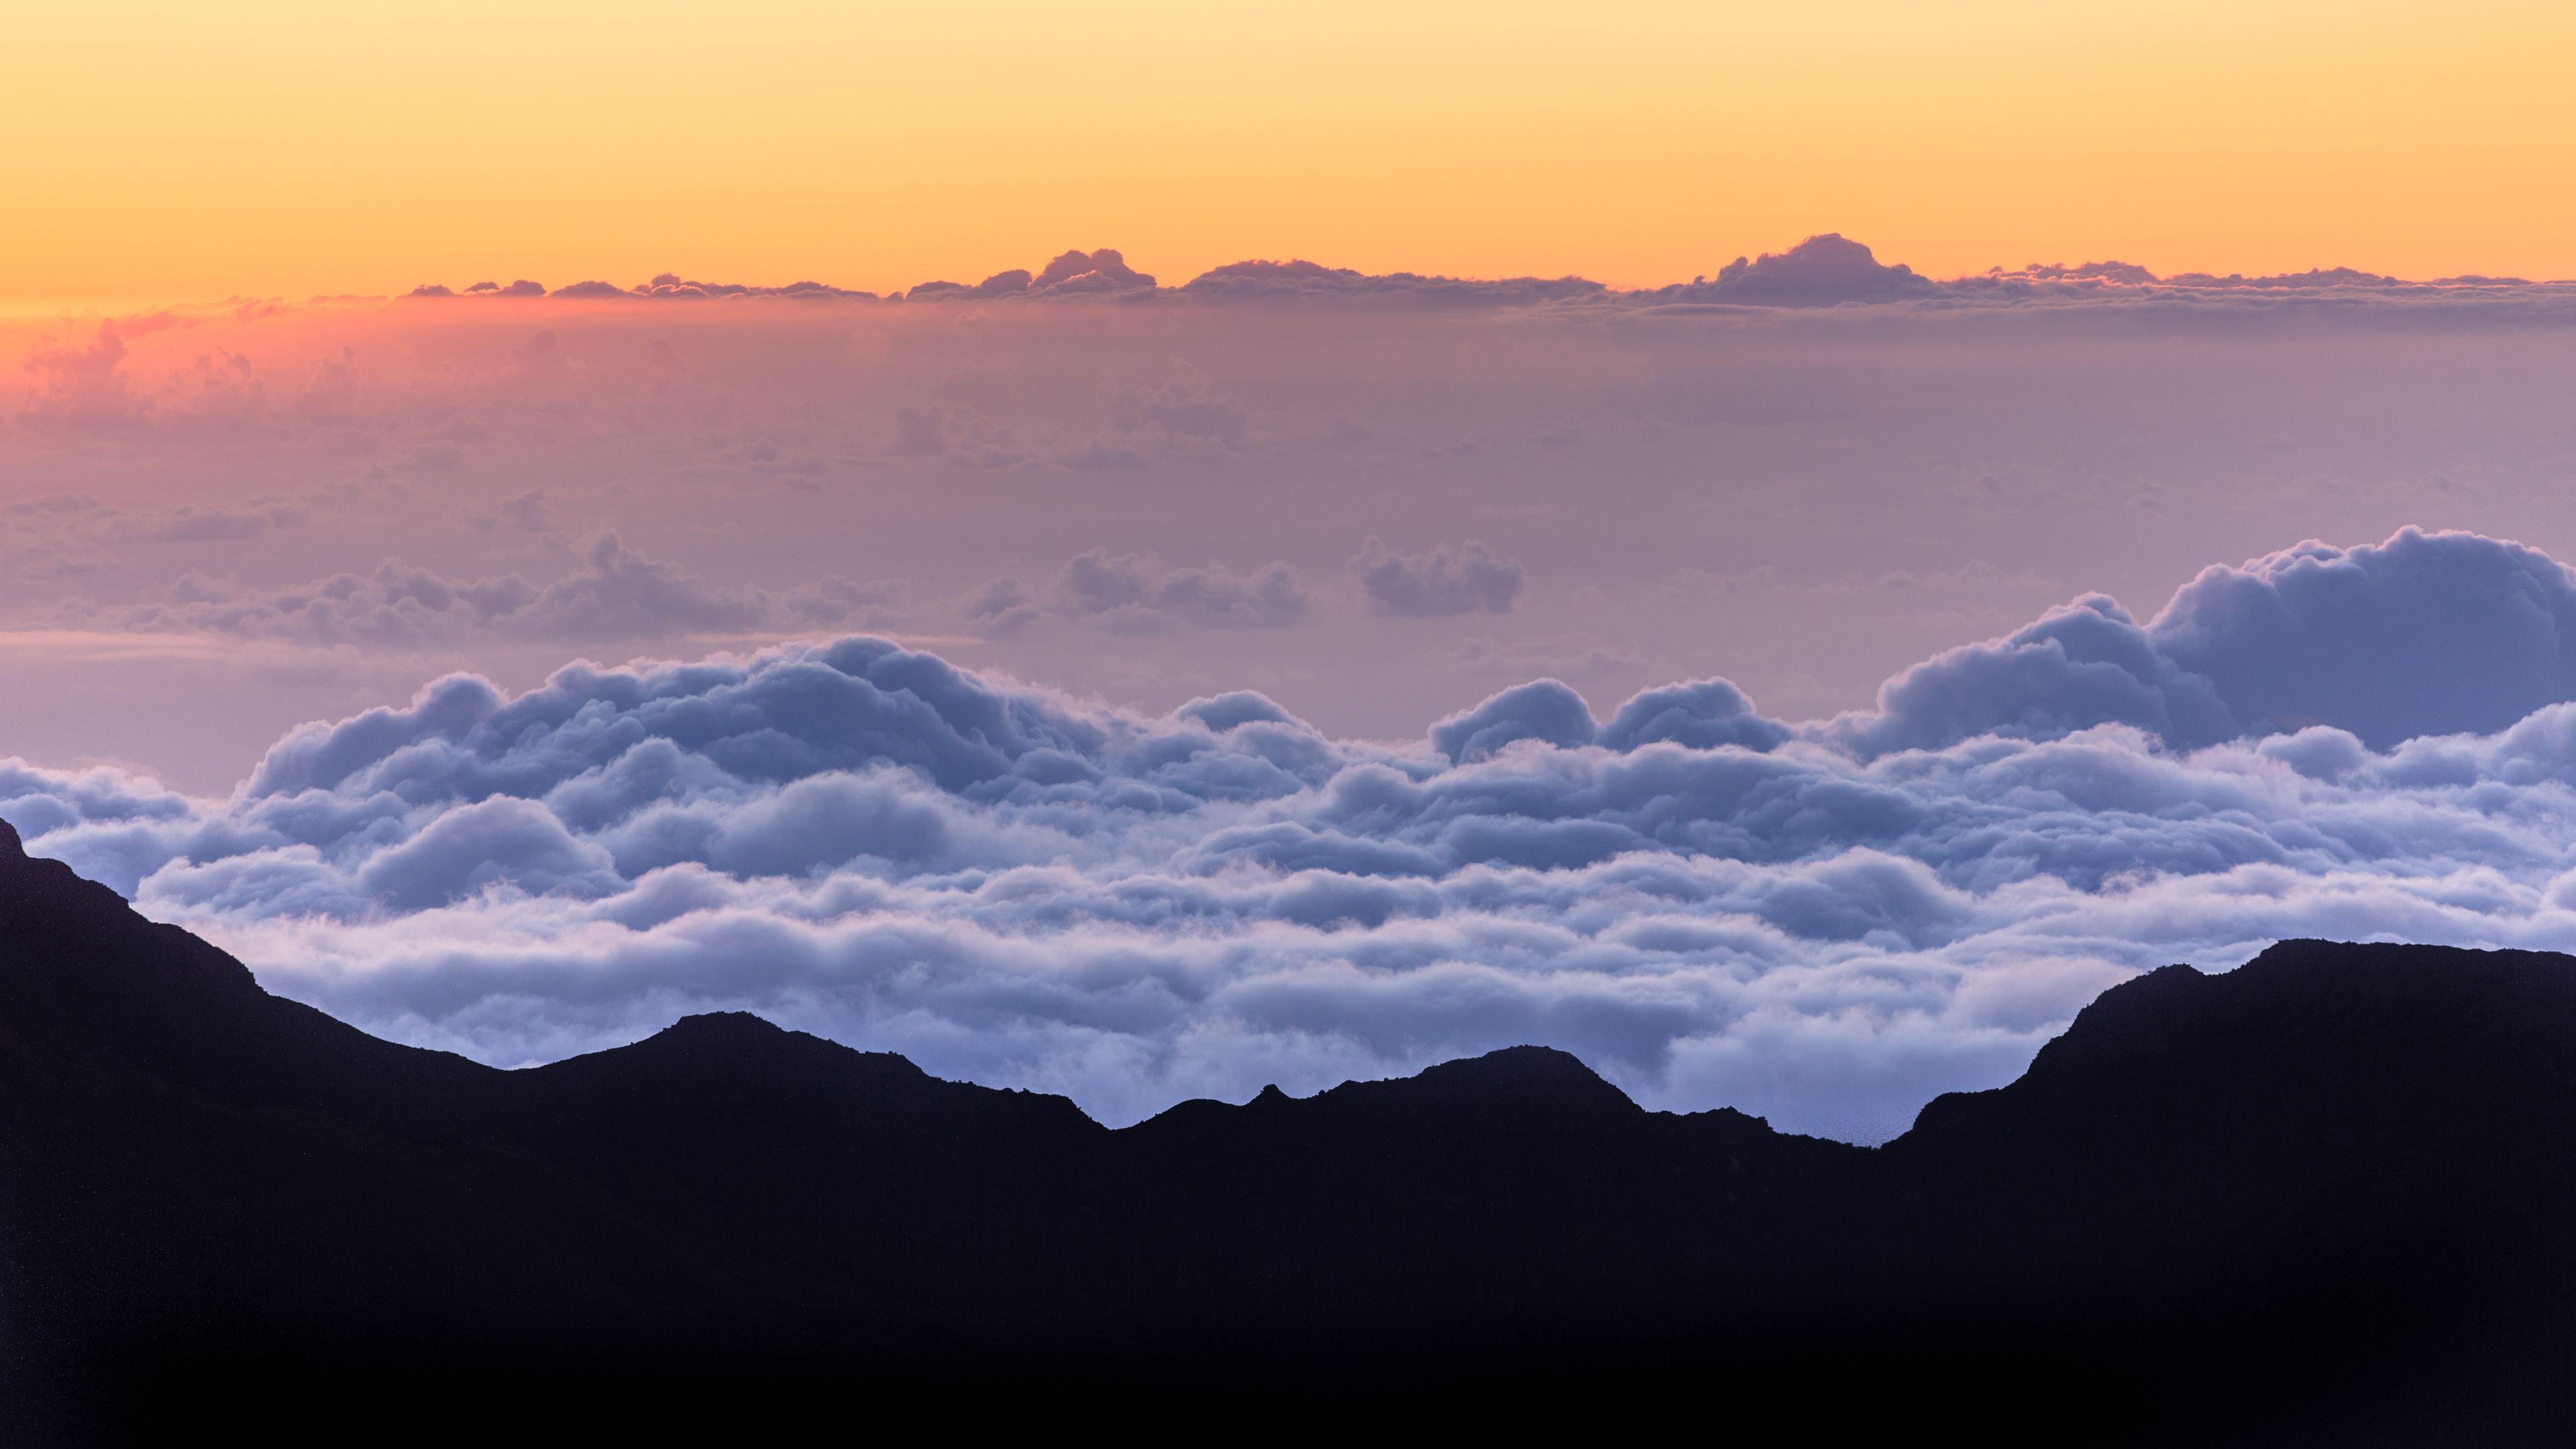 sea of clouds mountains 5k 1540142967 - Sea Of Clouds Mountains 5k - sea of clouds wallpapers, nature wallpapers, mountains wallpapers, hd-wallpapers, clouds wallpapers, 5k wallpapers, 4k-wallpapers